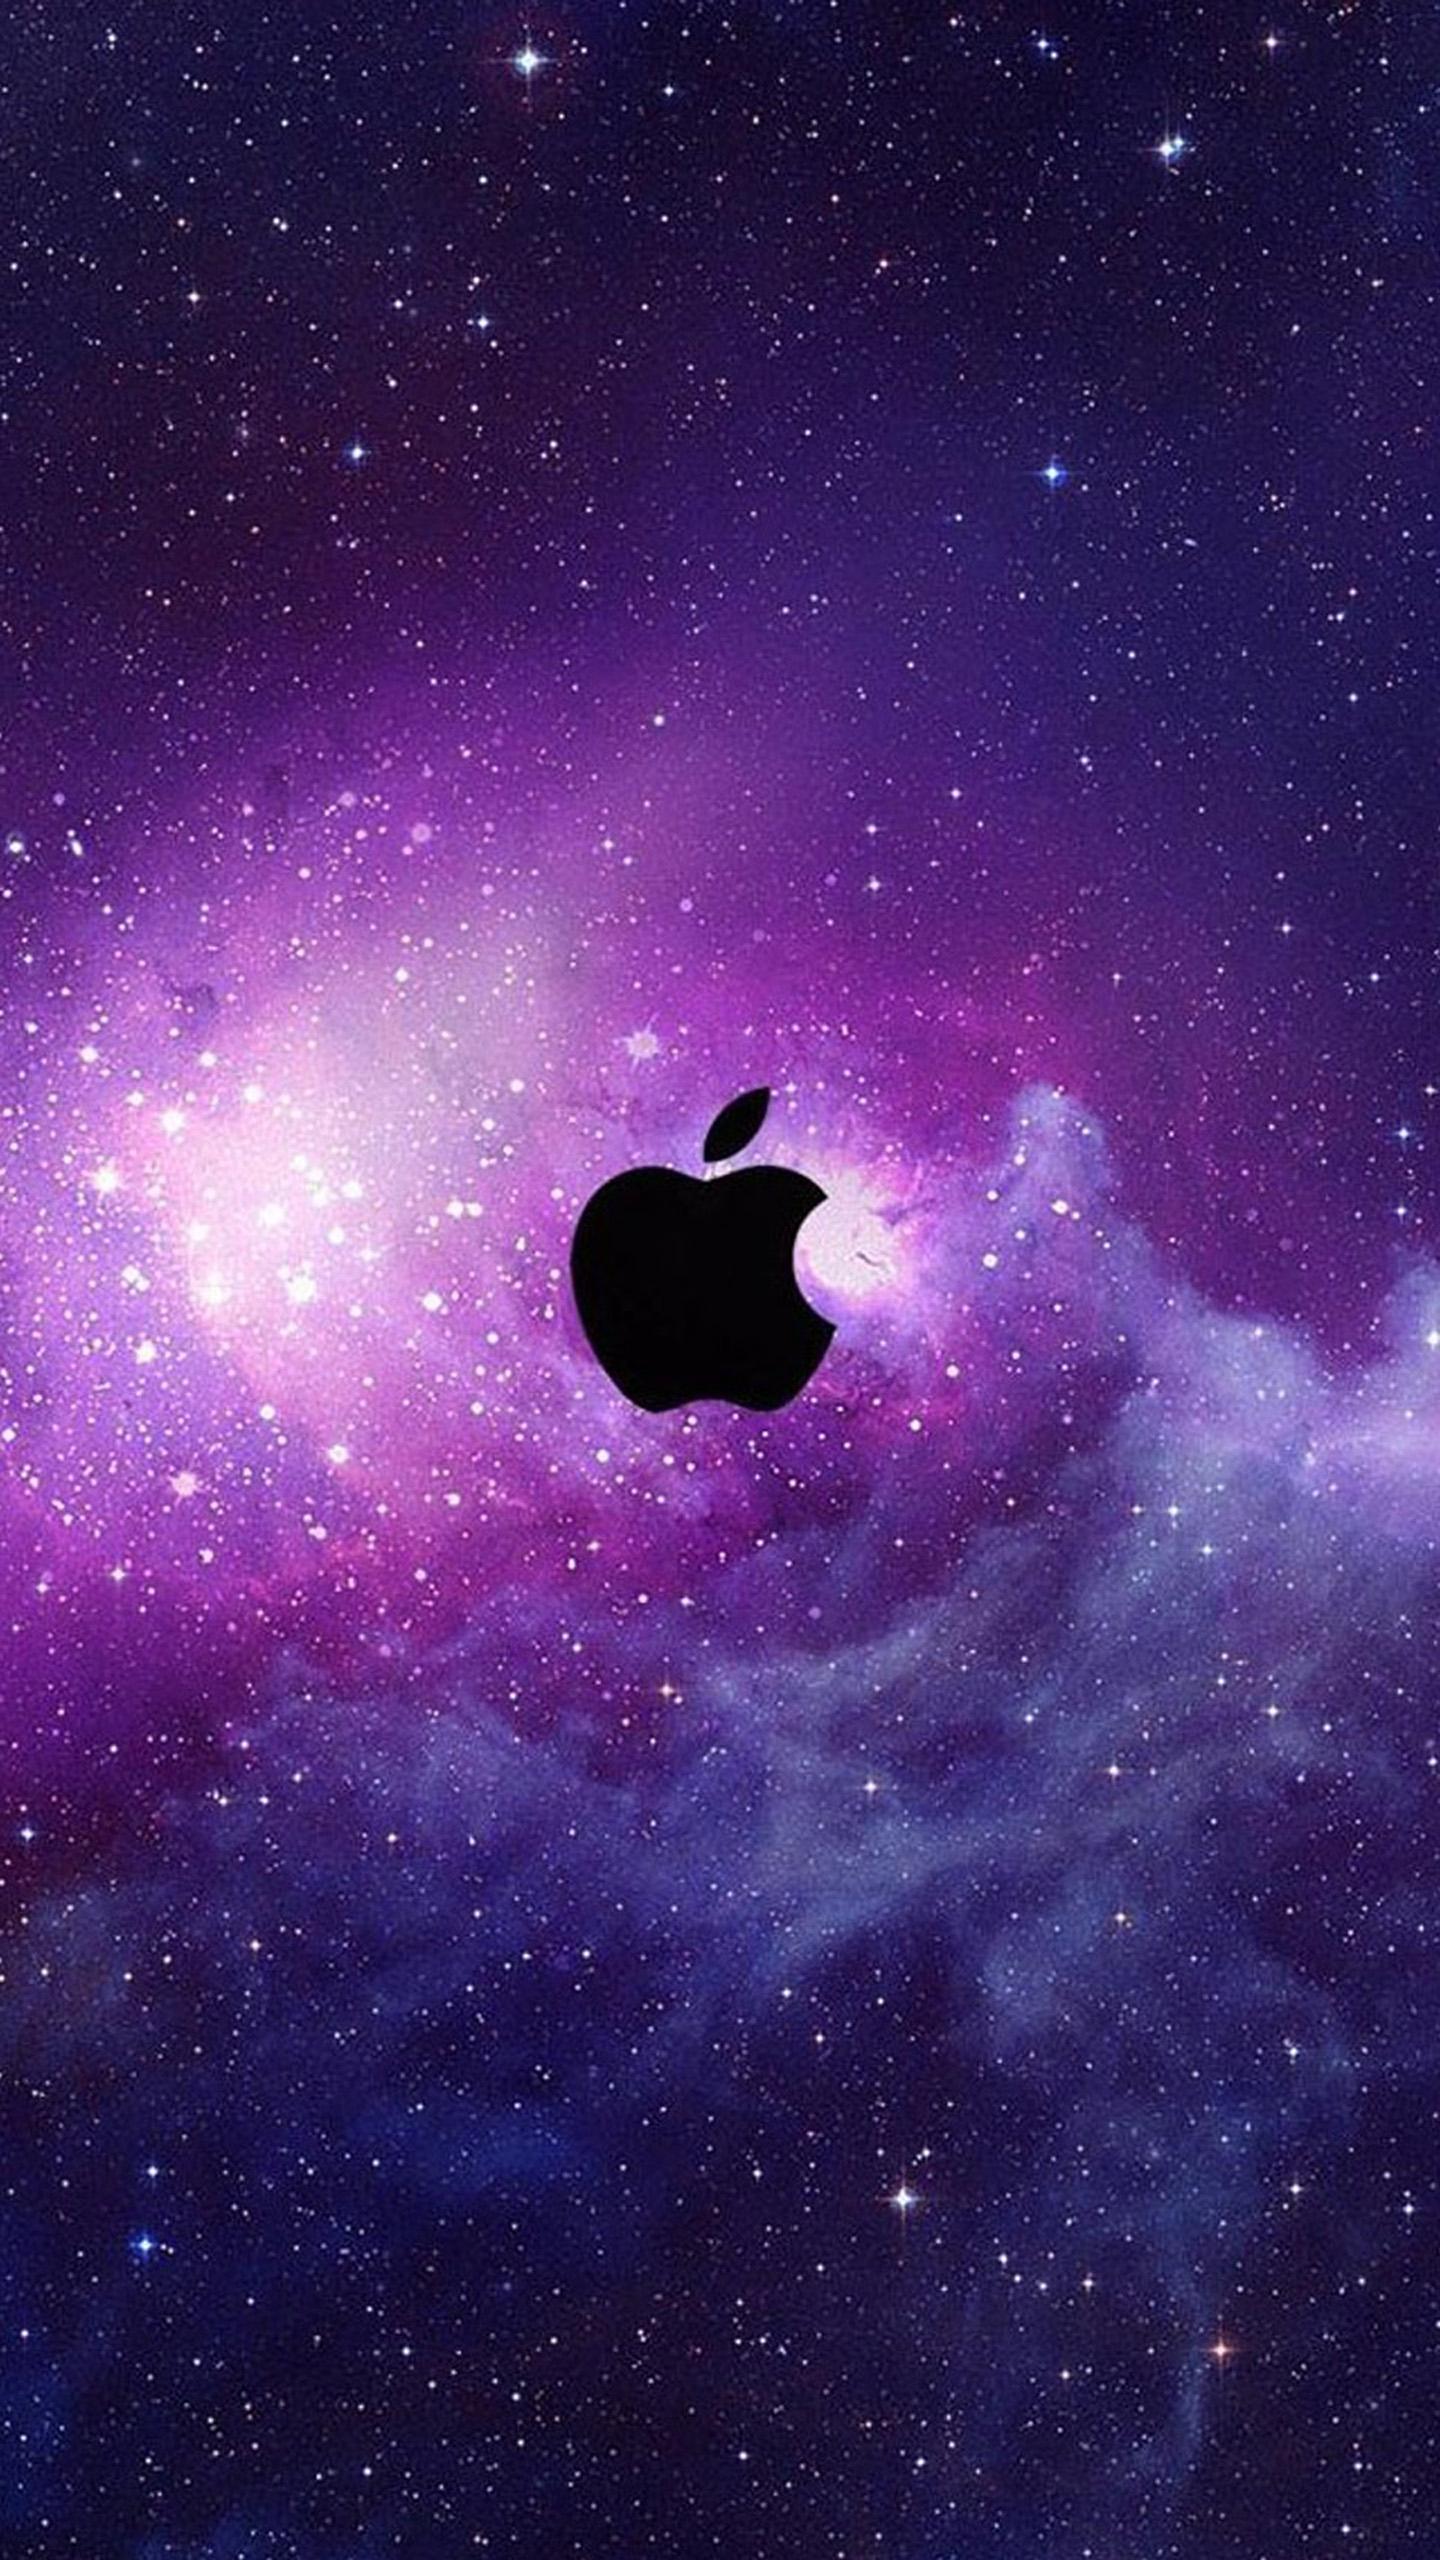 Deep Space Iphone Wallpapers 4 - Apple Logo Wallpaper Iphone 7 Plus , HD Wallpaper & Backgrounds